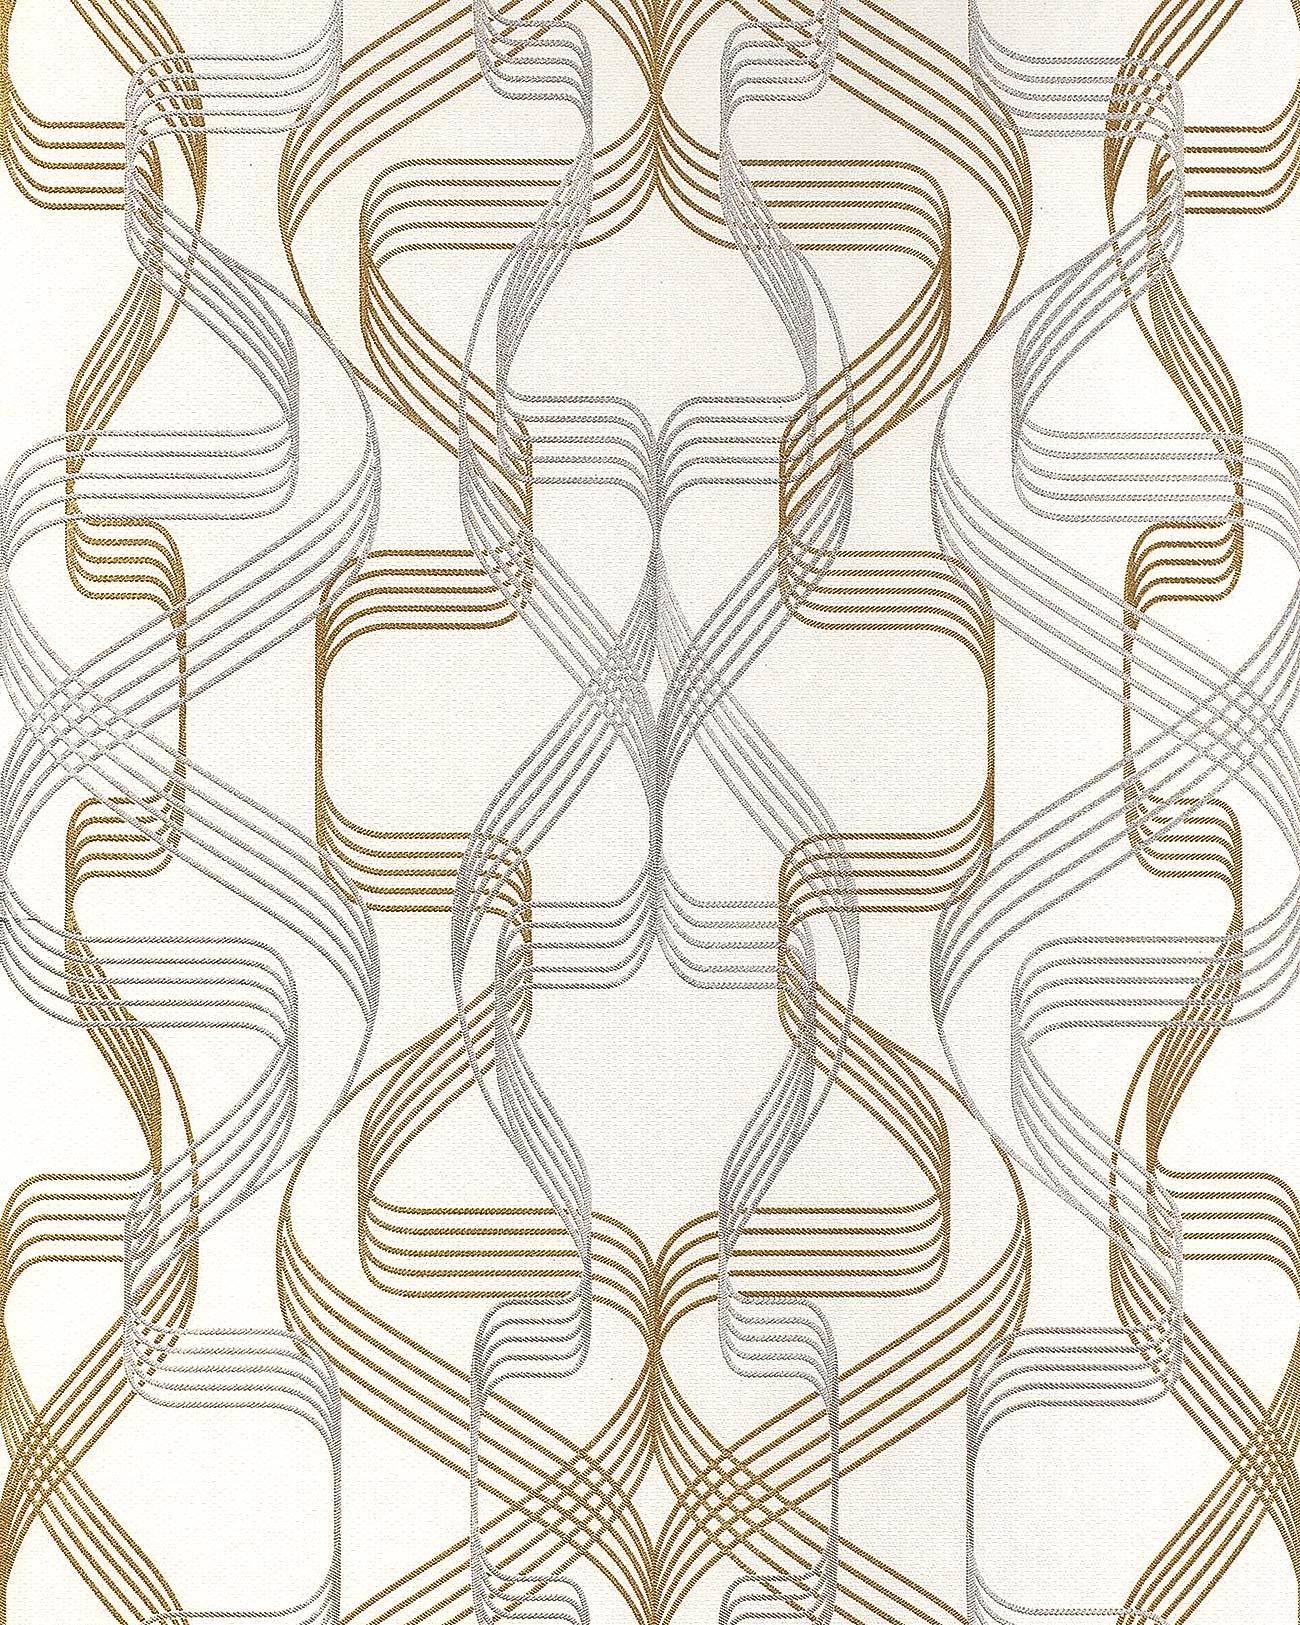 Graphic Wallpaper Wall Covering Edem 507 20 Blown Vinyl